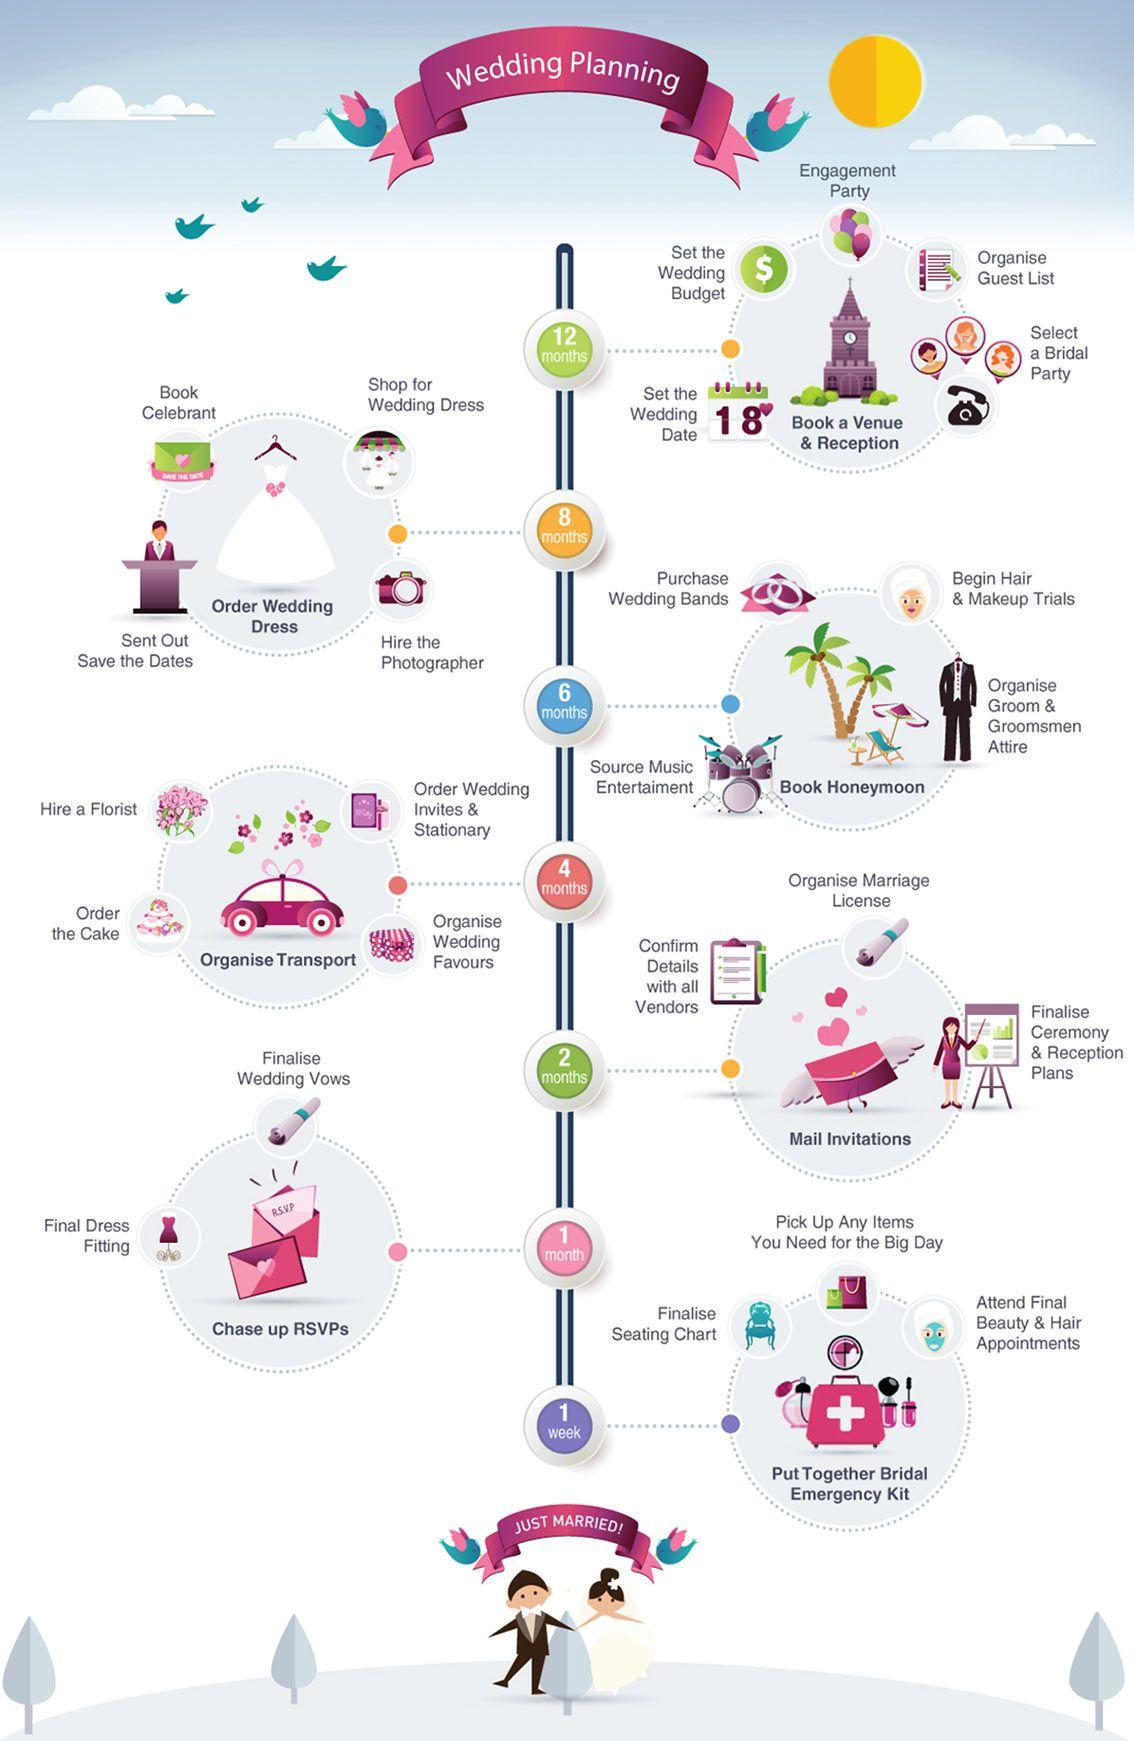 PreWedding Events Timeline Infographic Timeline infographic